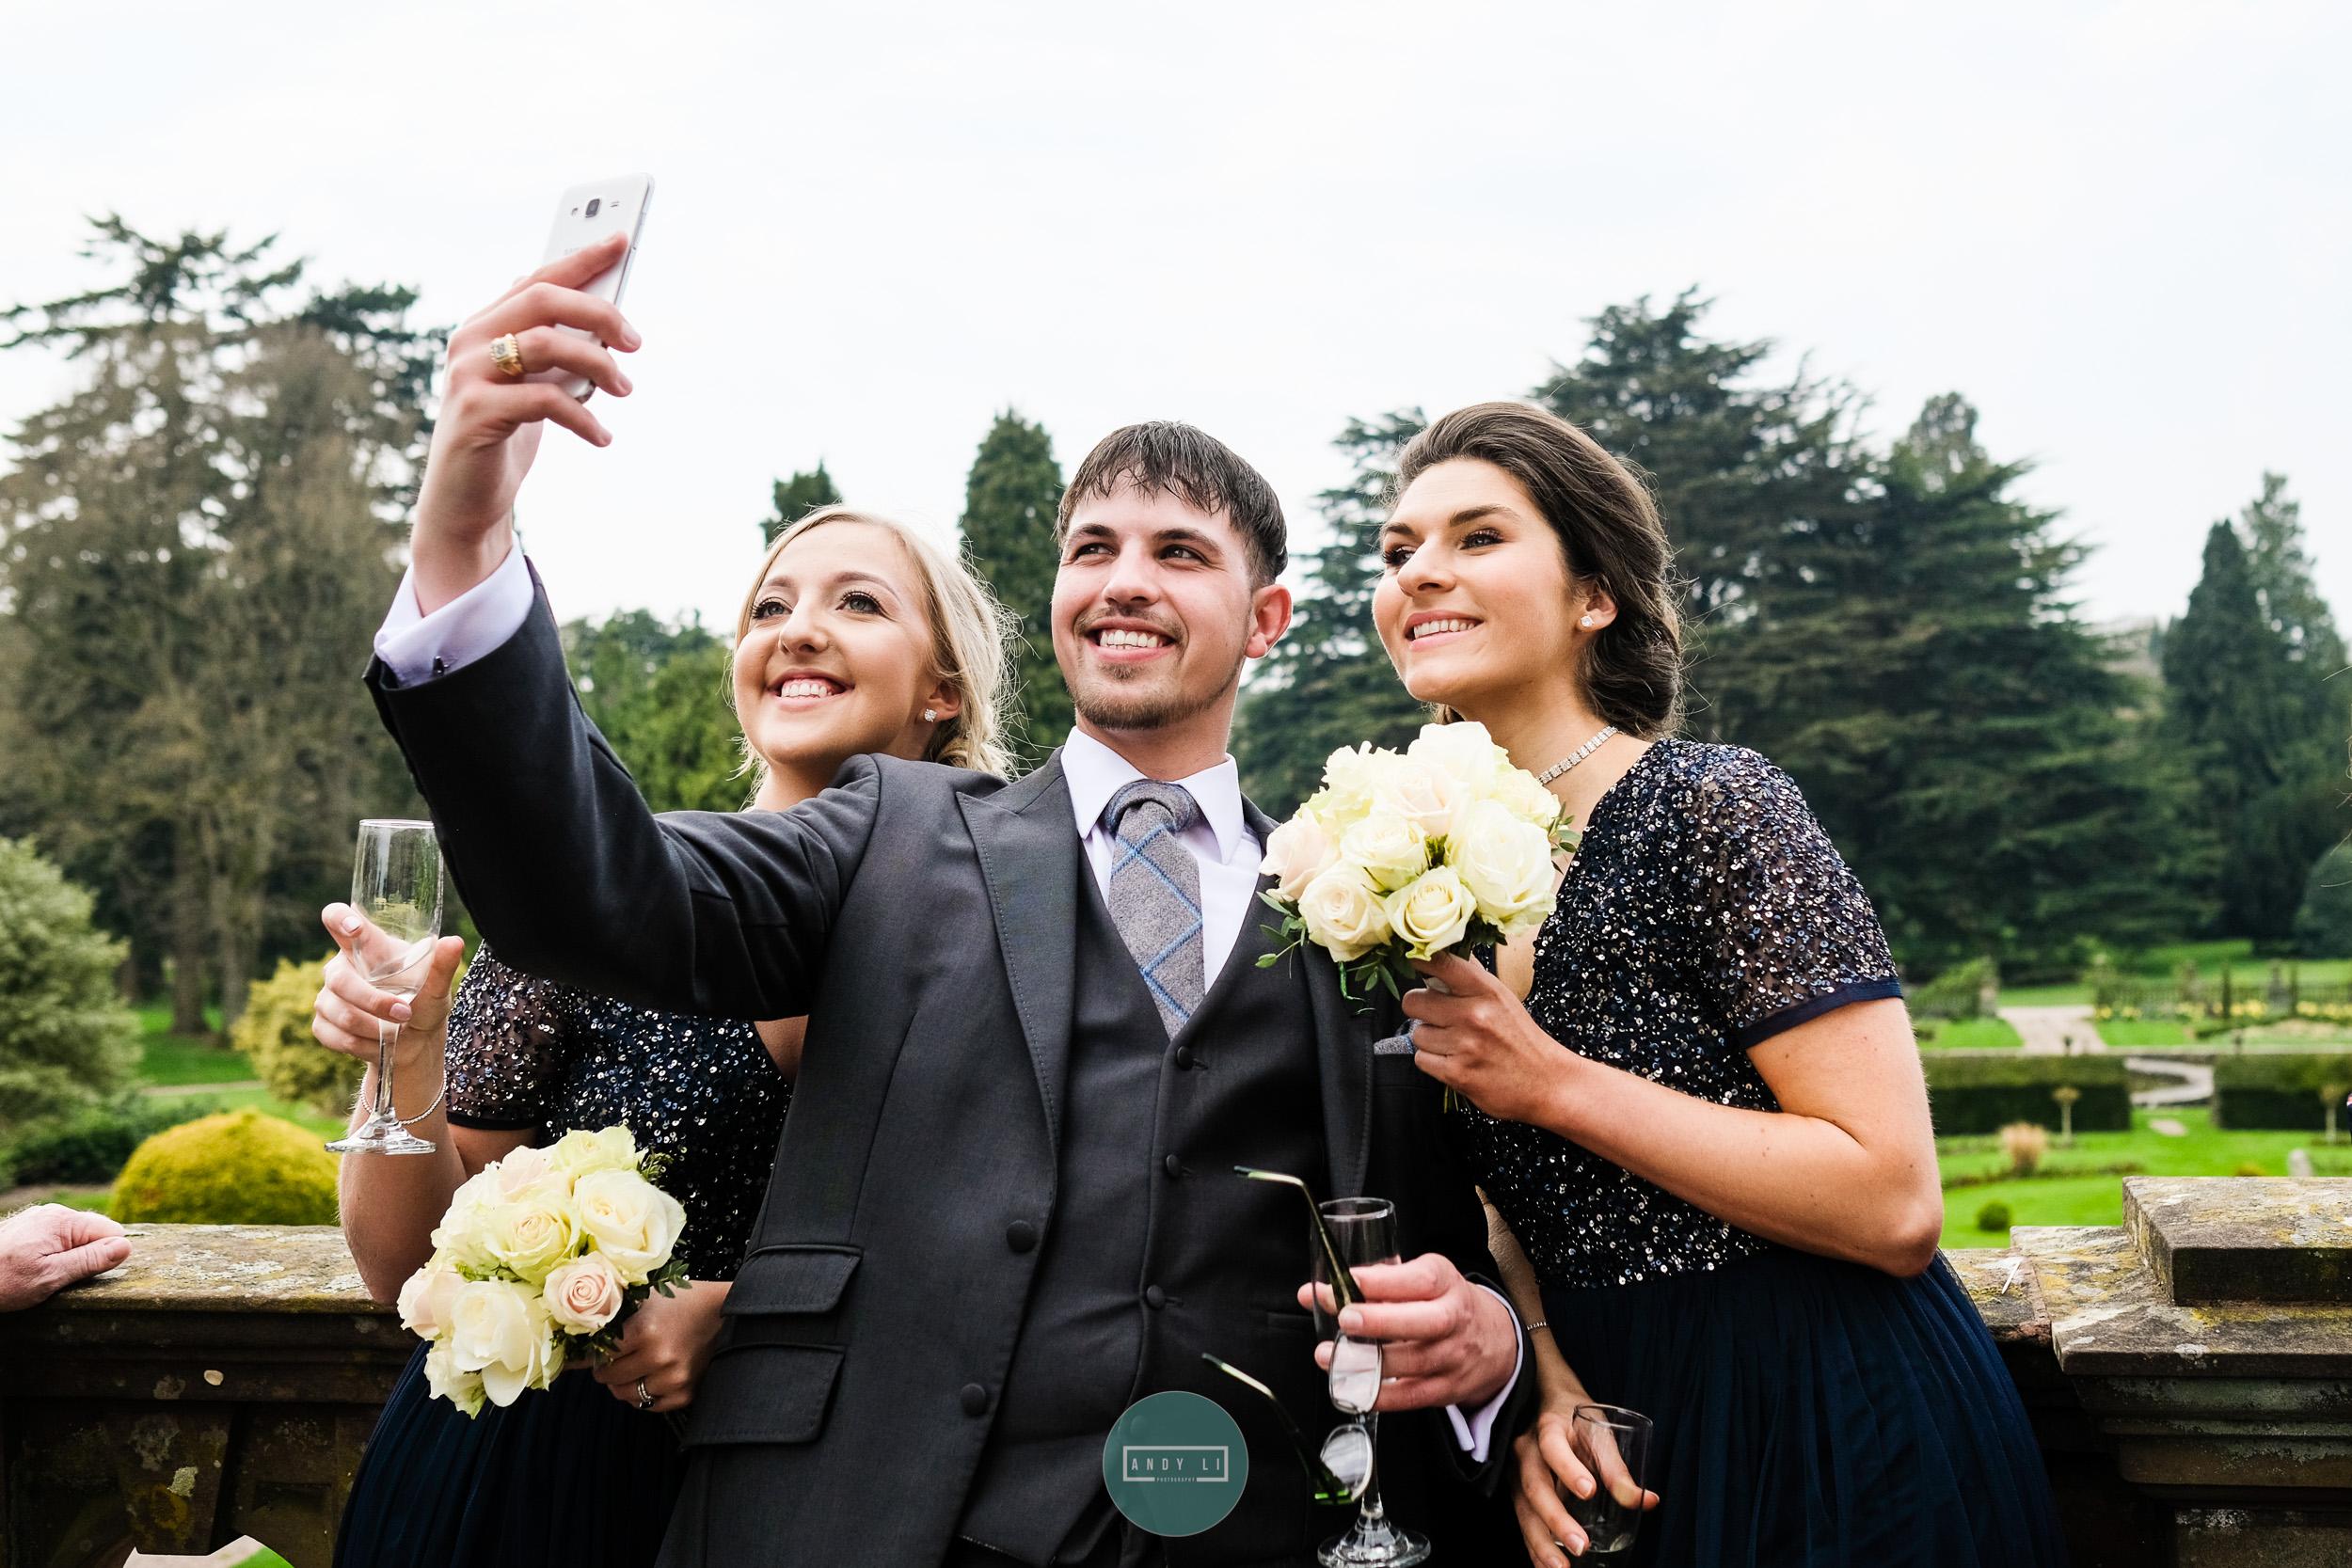 Lilleshall Hall Wedding Photographer-043-AXT21813.jpg